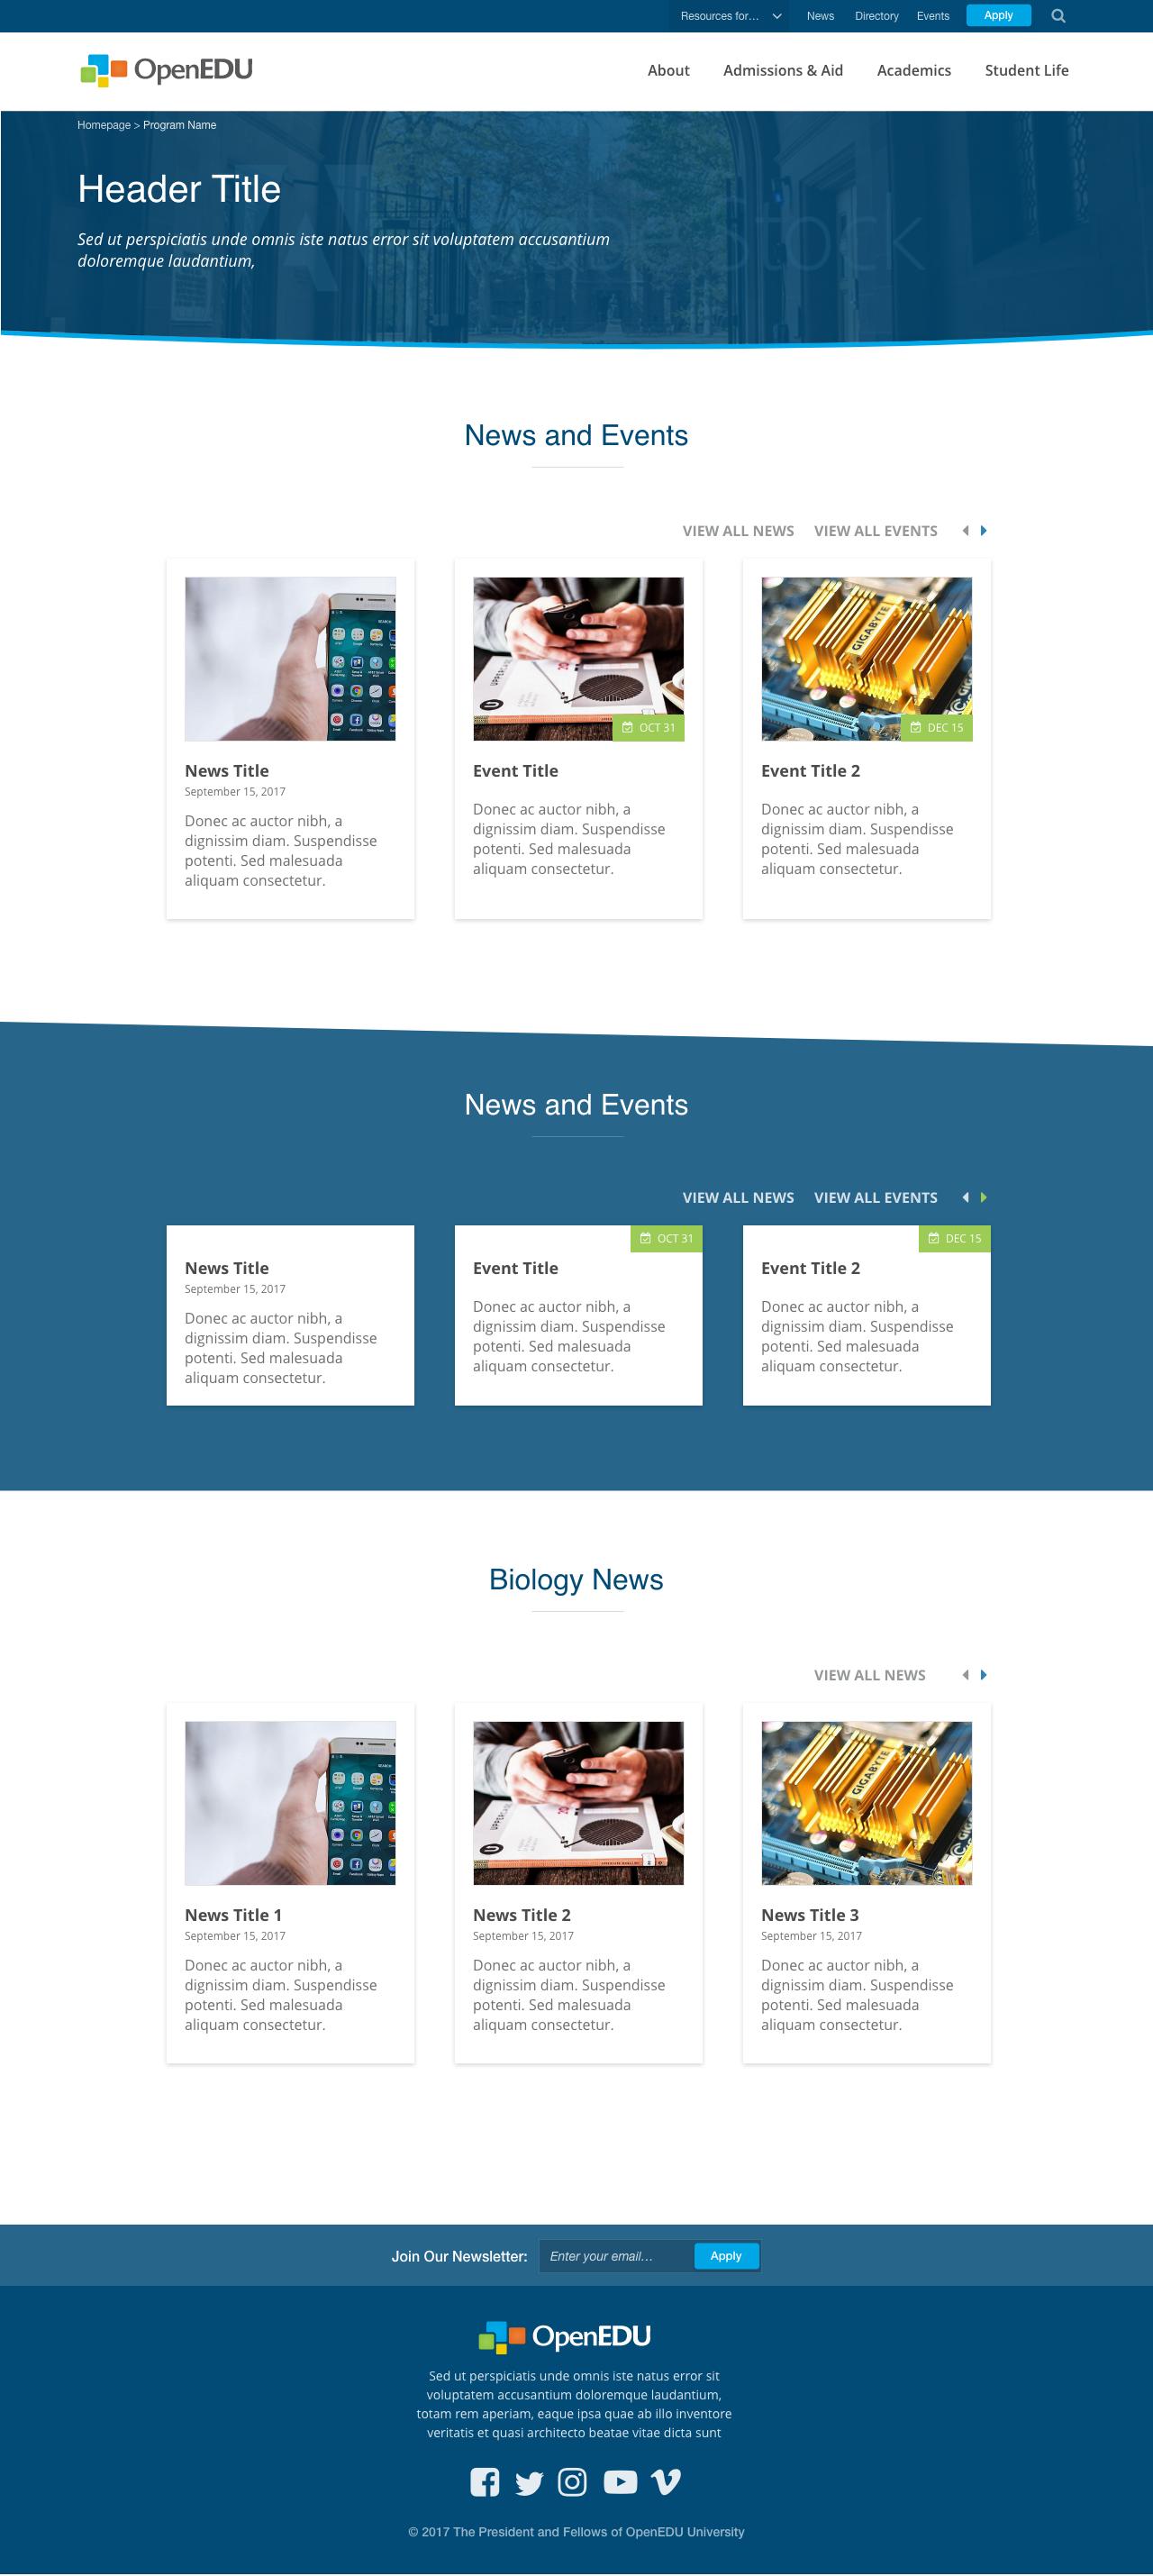 Add News and events listing widget [#2910539] | Drupal org